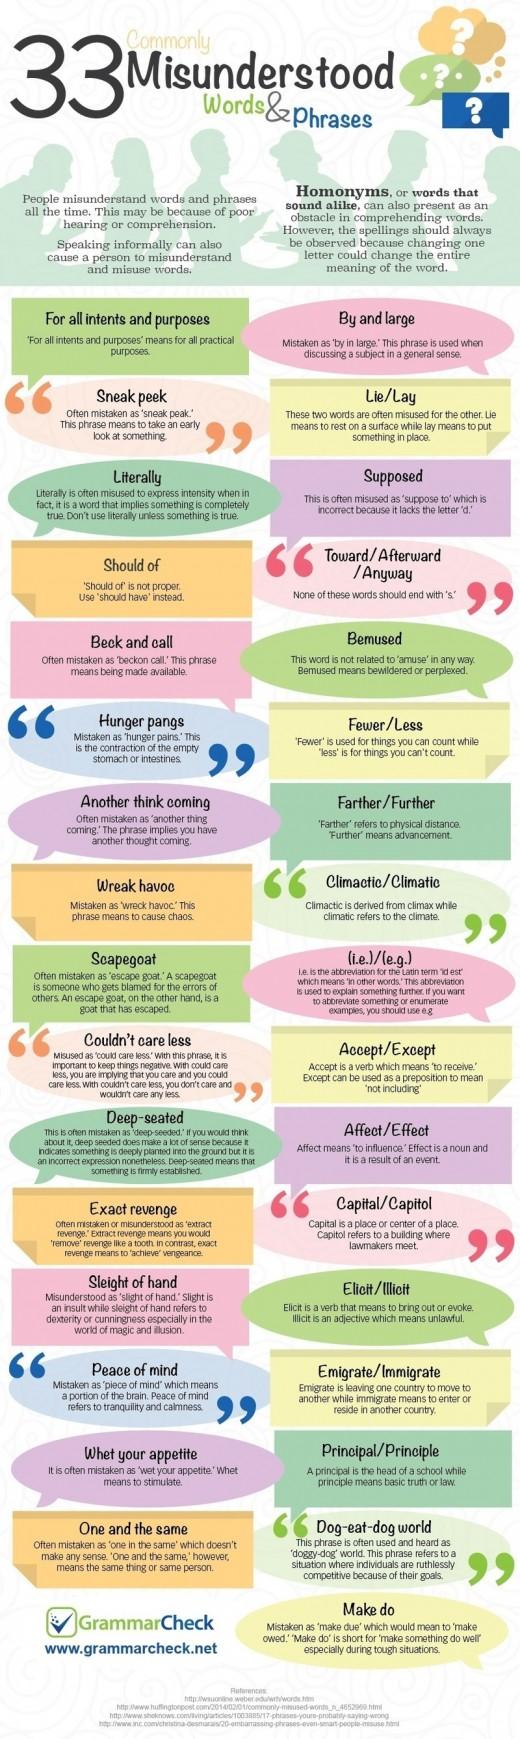 Commonly misunderstood words & phrases